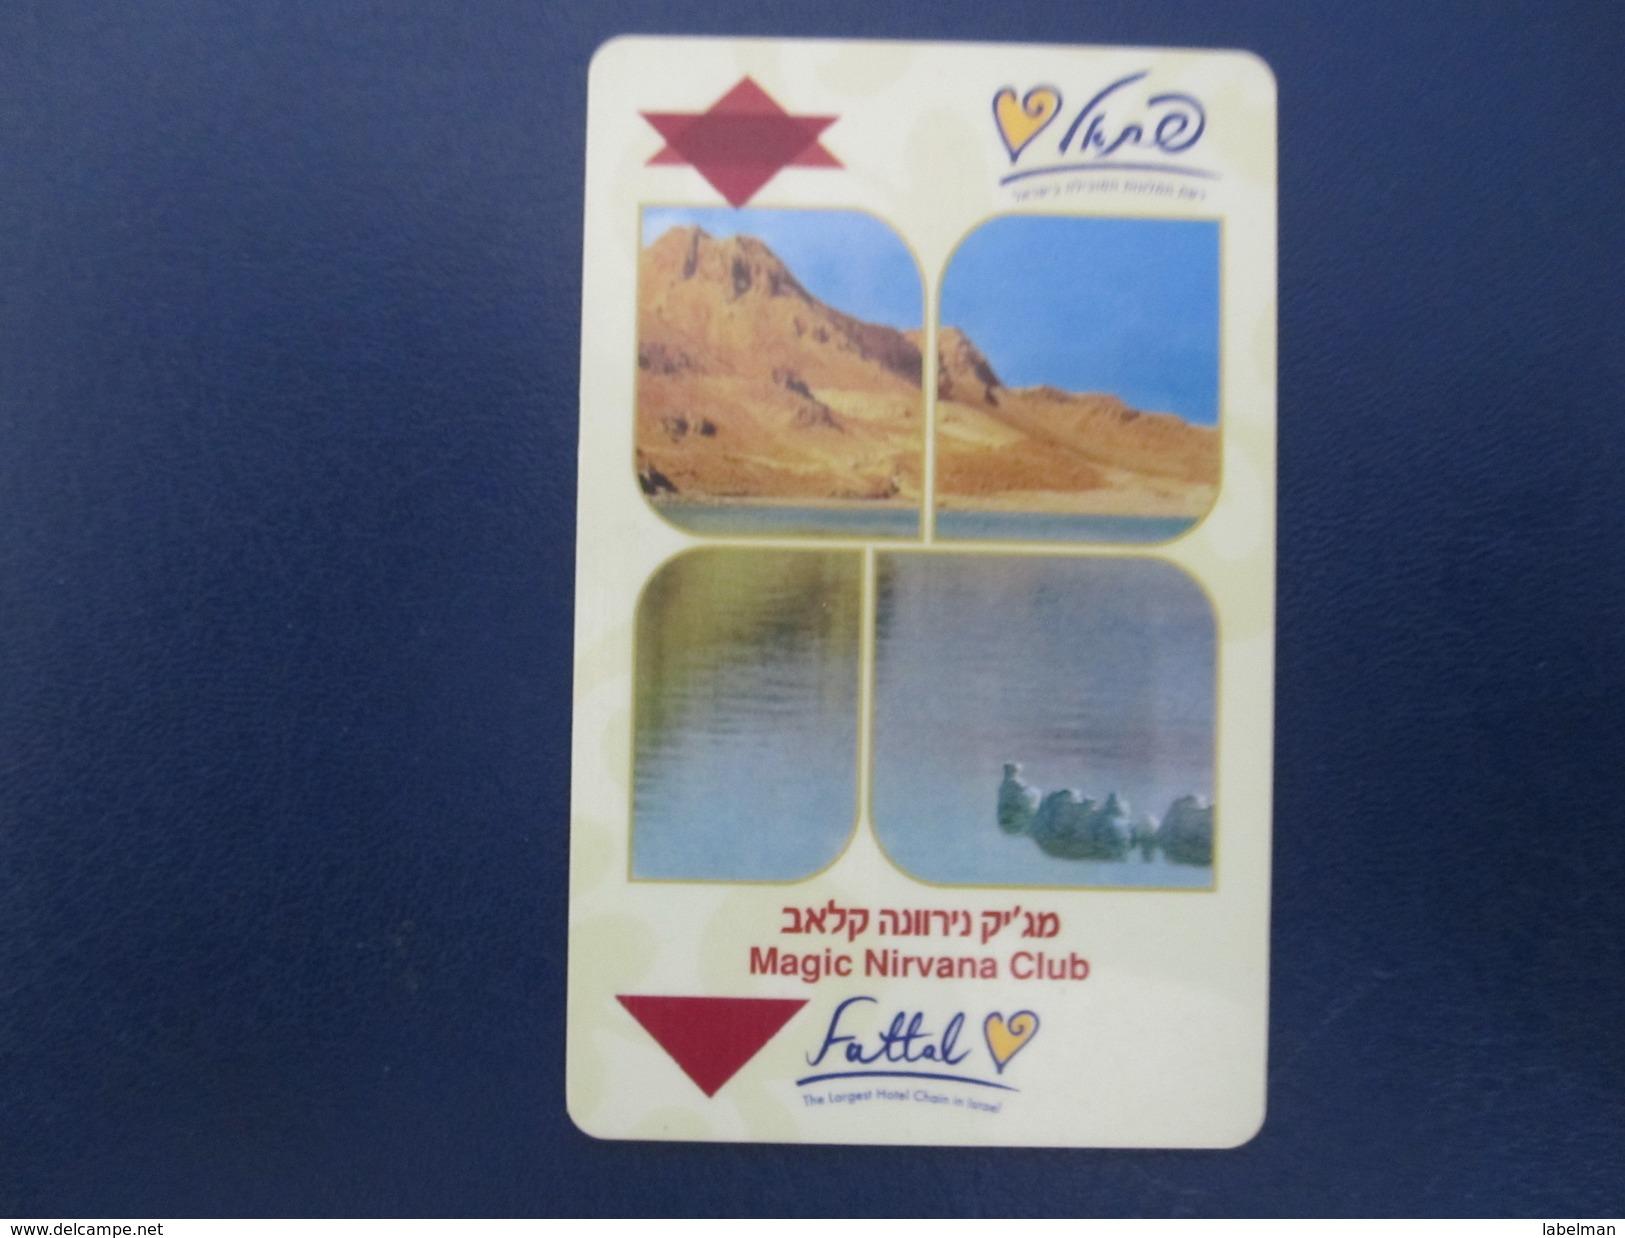 HOTEL MOTEL INN PENSION MOTOR HOUSE MAGIC NIRVANA CLUB FATTAL DEAD SEA HAIFA JERUSALEM TIBERIAS EILAT KEY CARD ISRAEL - Hotel Labels